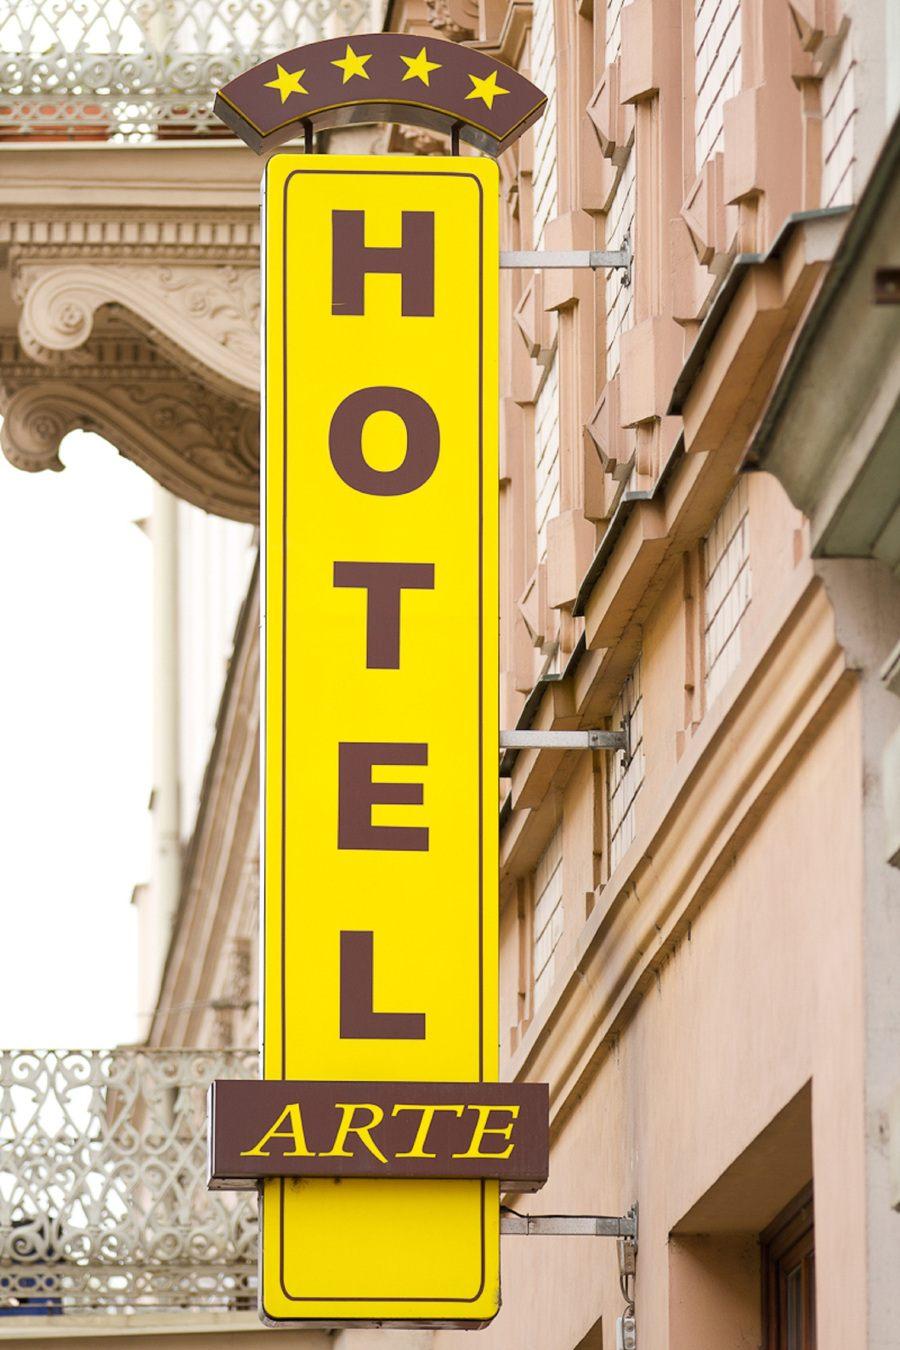 Hotel Arte - Exterier 2